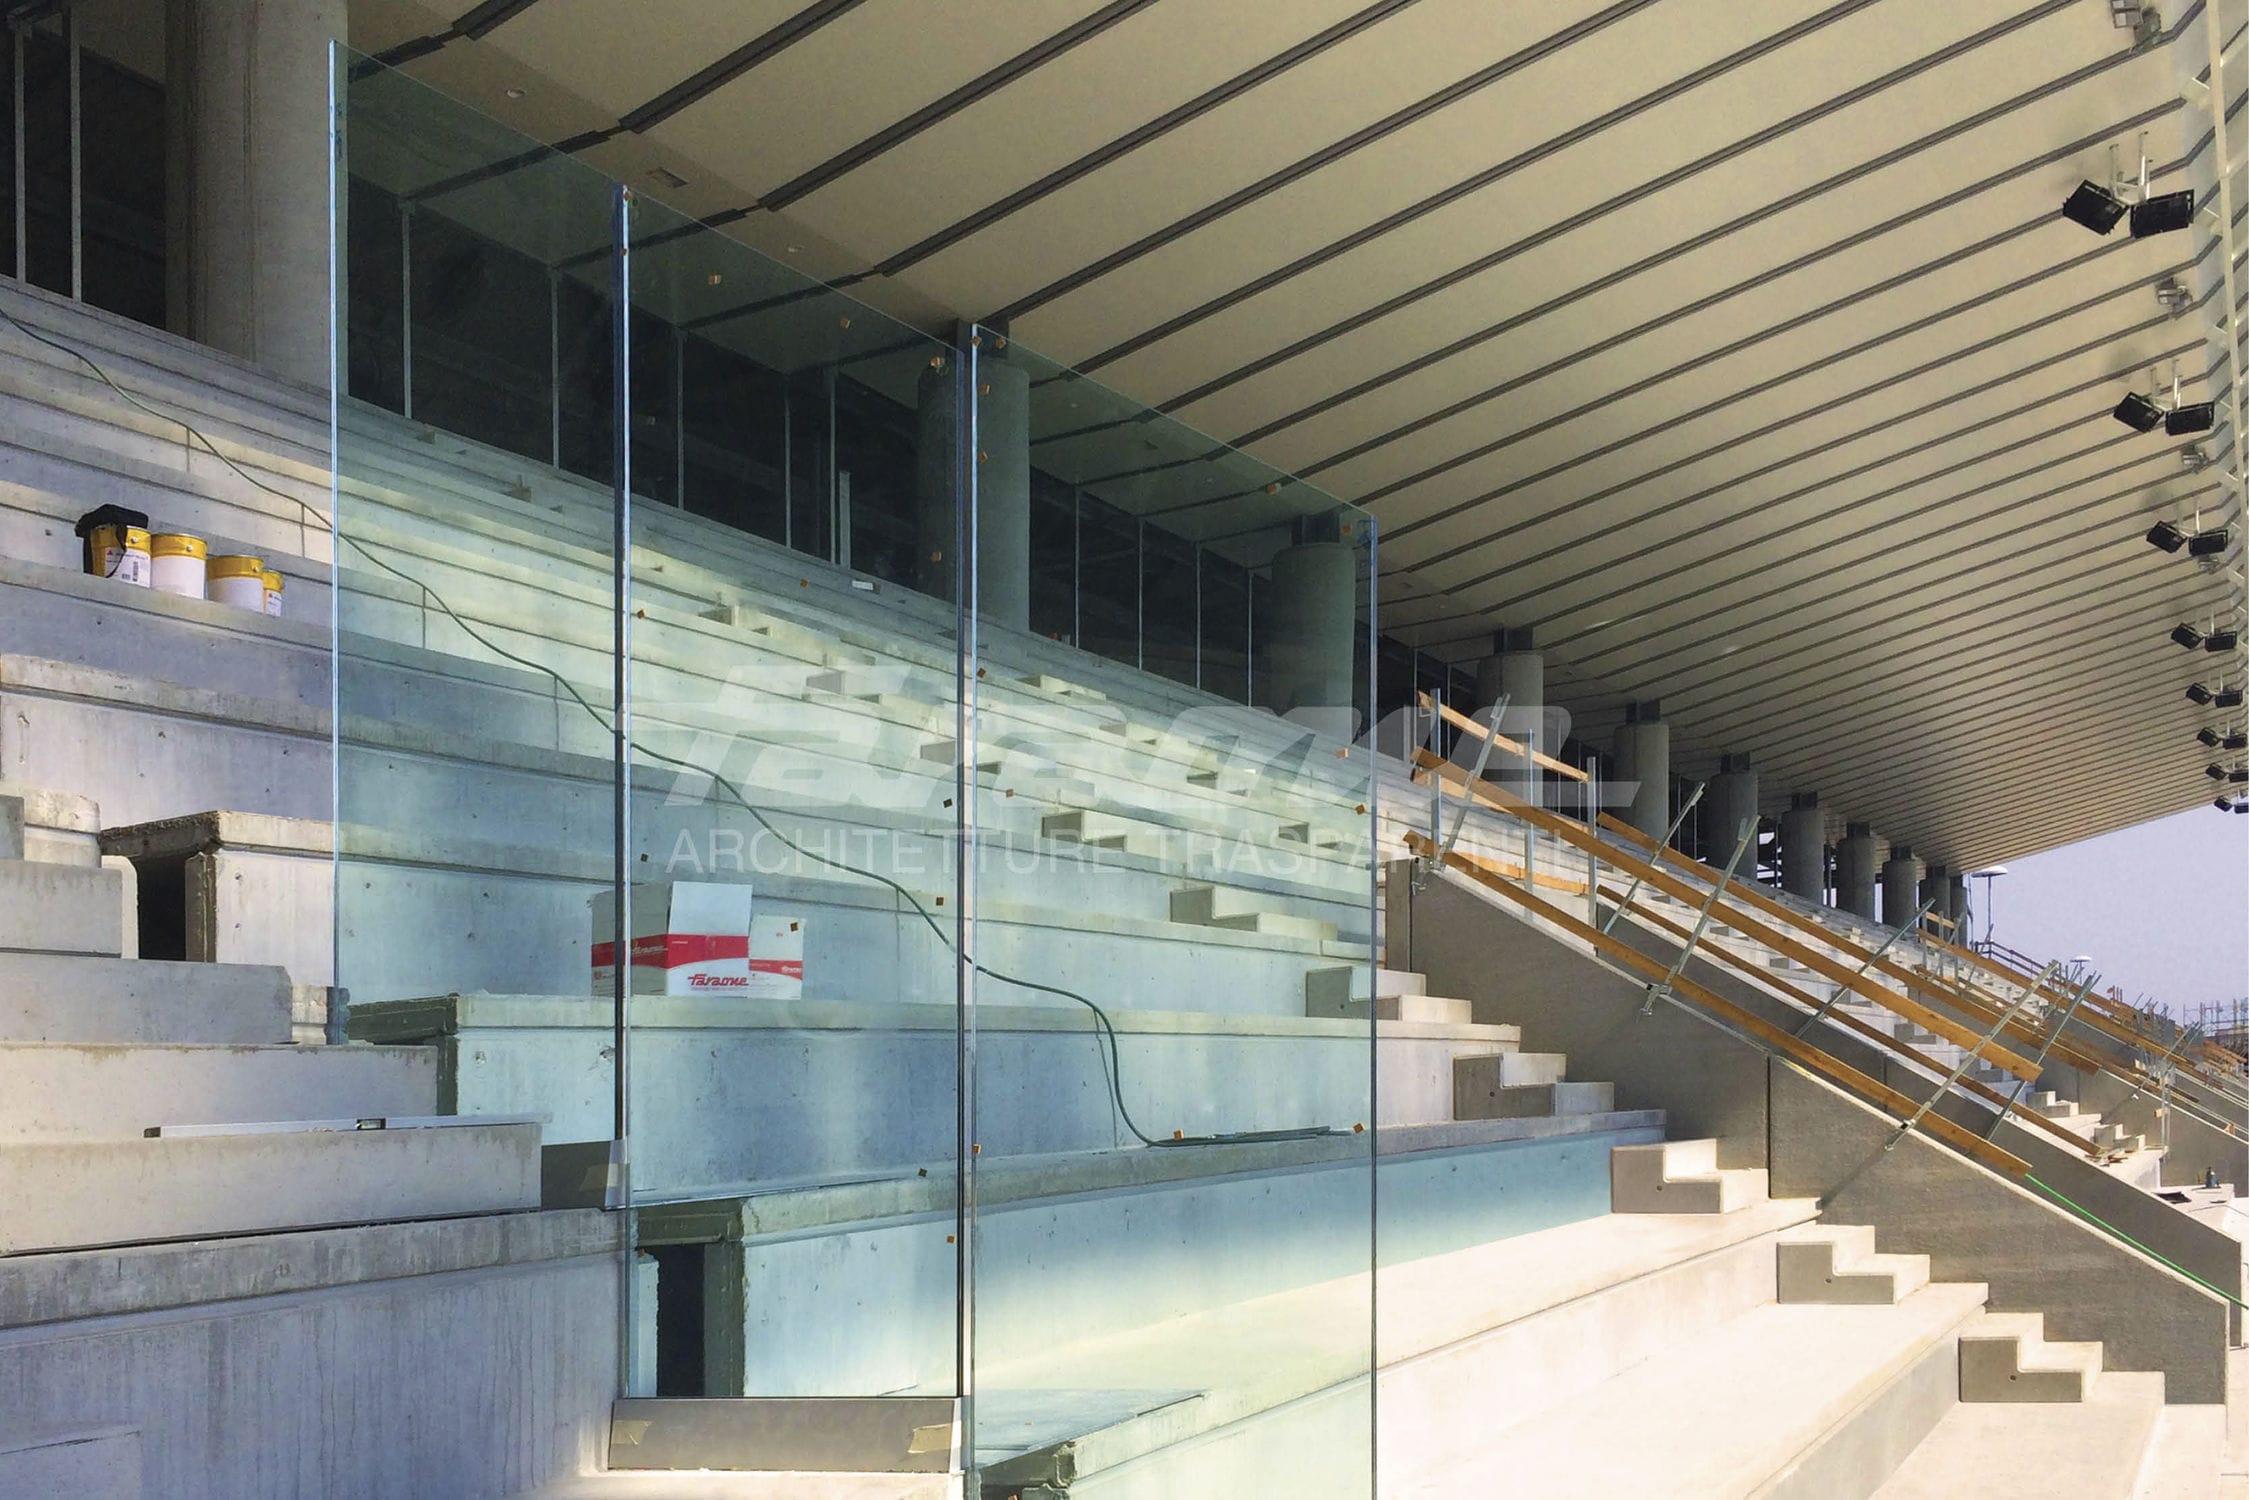 divisoria per tifoseria allo stadio